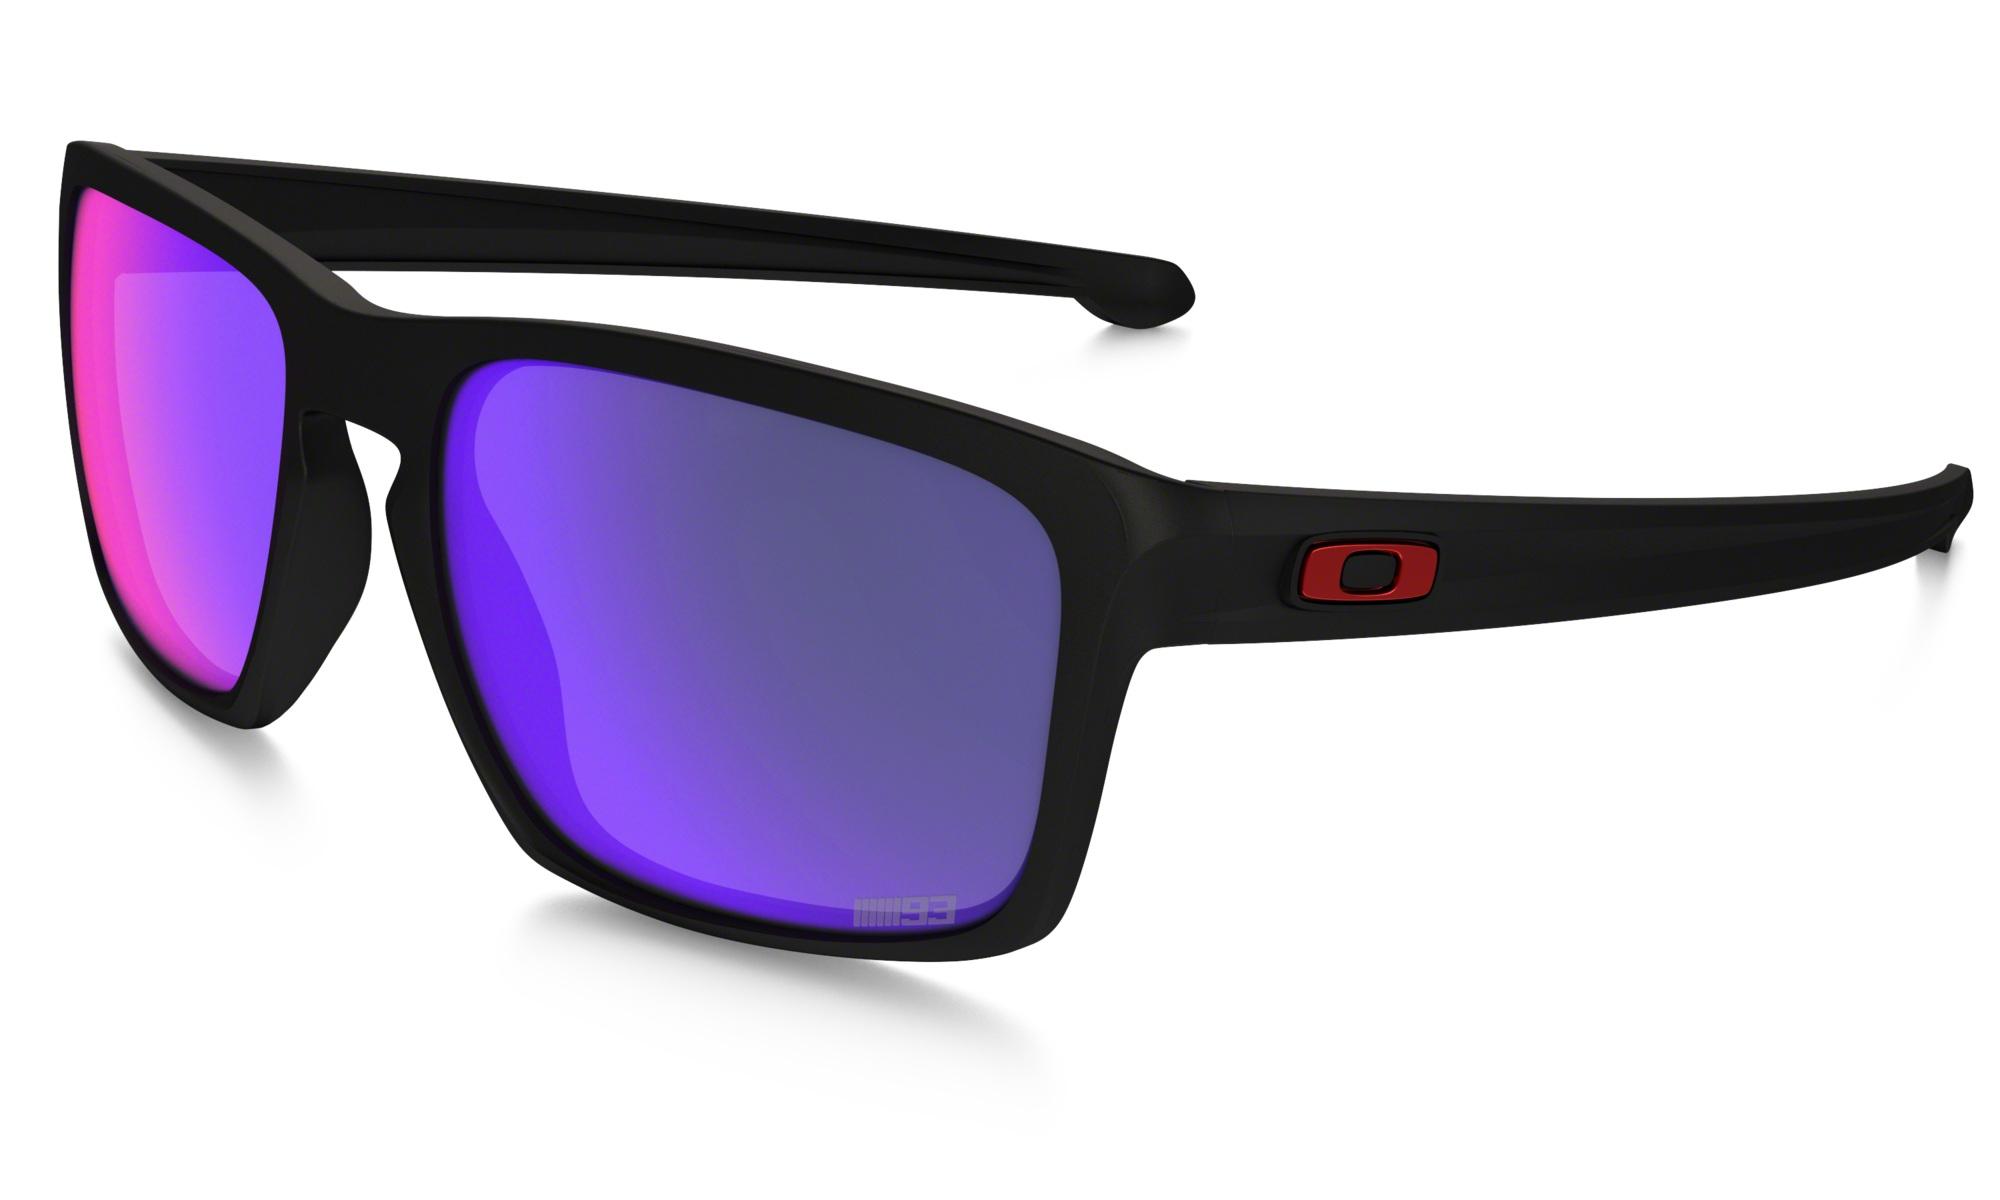 Oakley Sliver OO9262 20 1 ARFc0fQ6Zb